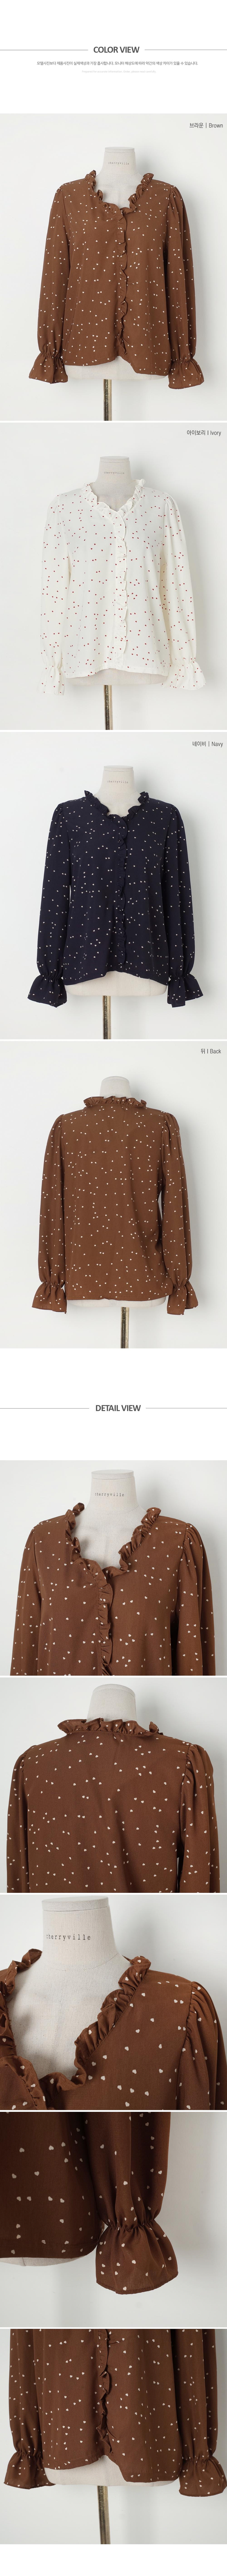 Lovely ruffle heart blouse